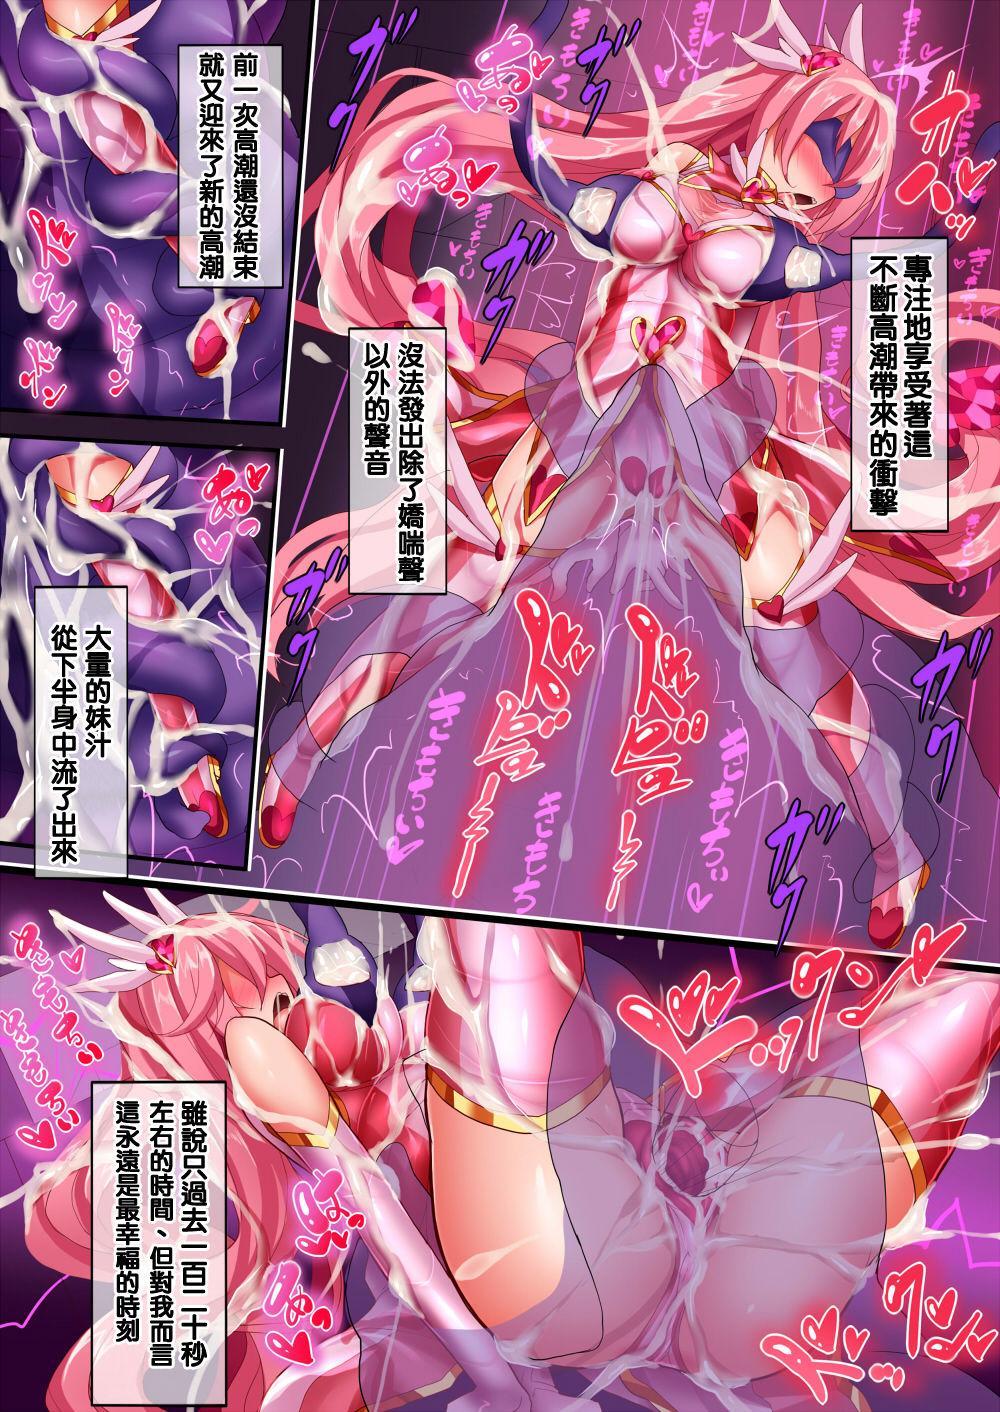 [Makutsutei (Nagai Wataru)] Orgasm Unit EX -Mahou Senshi Akari Ch. 1-2 [Chinese] [这很恶堕 x Lolipoi汉化组] 28